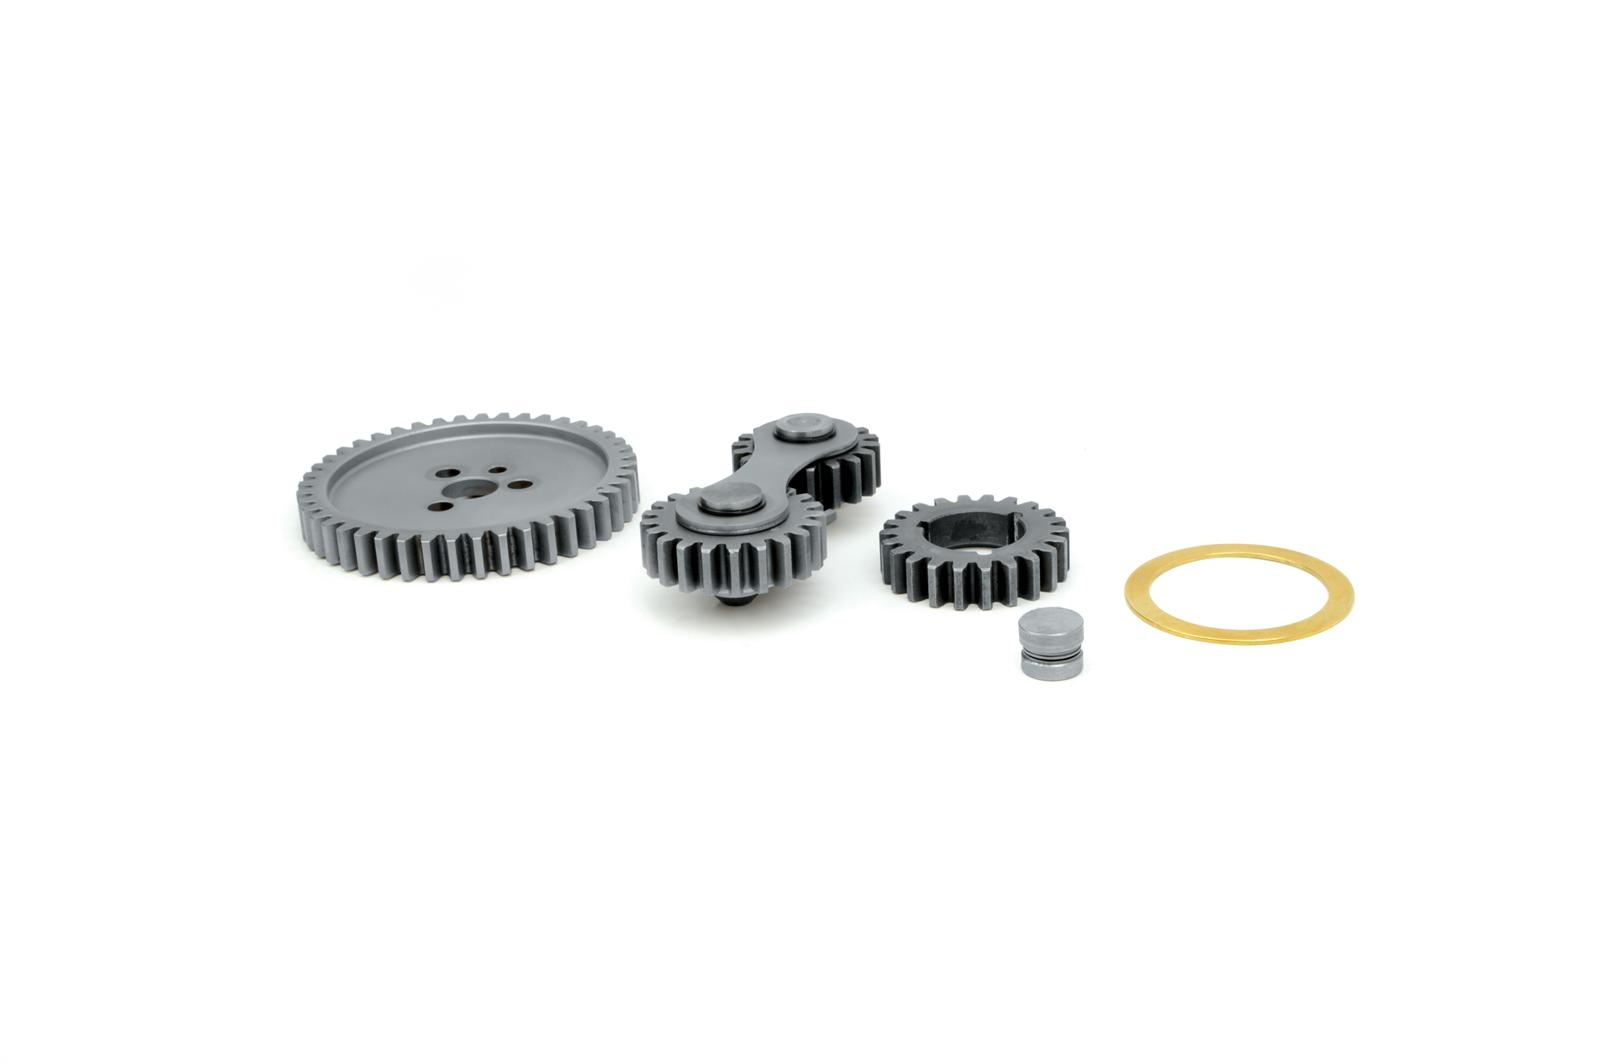 Edelbrock Gear Drive Accu-Drive Dual Idler Chevy Small Block Kit 7890